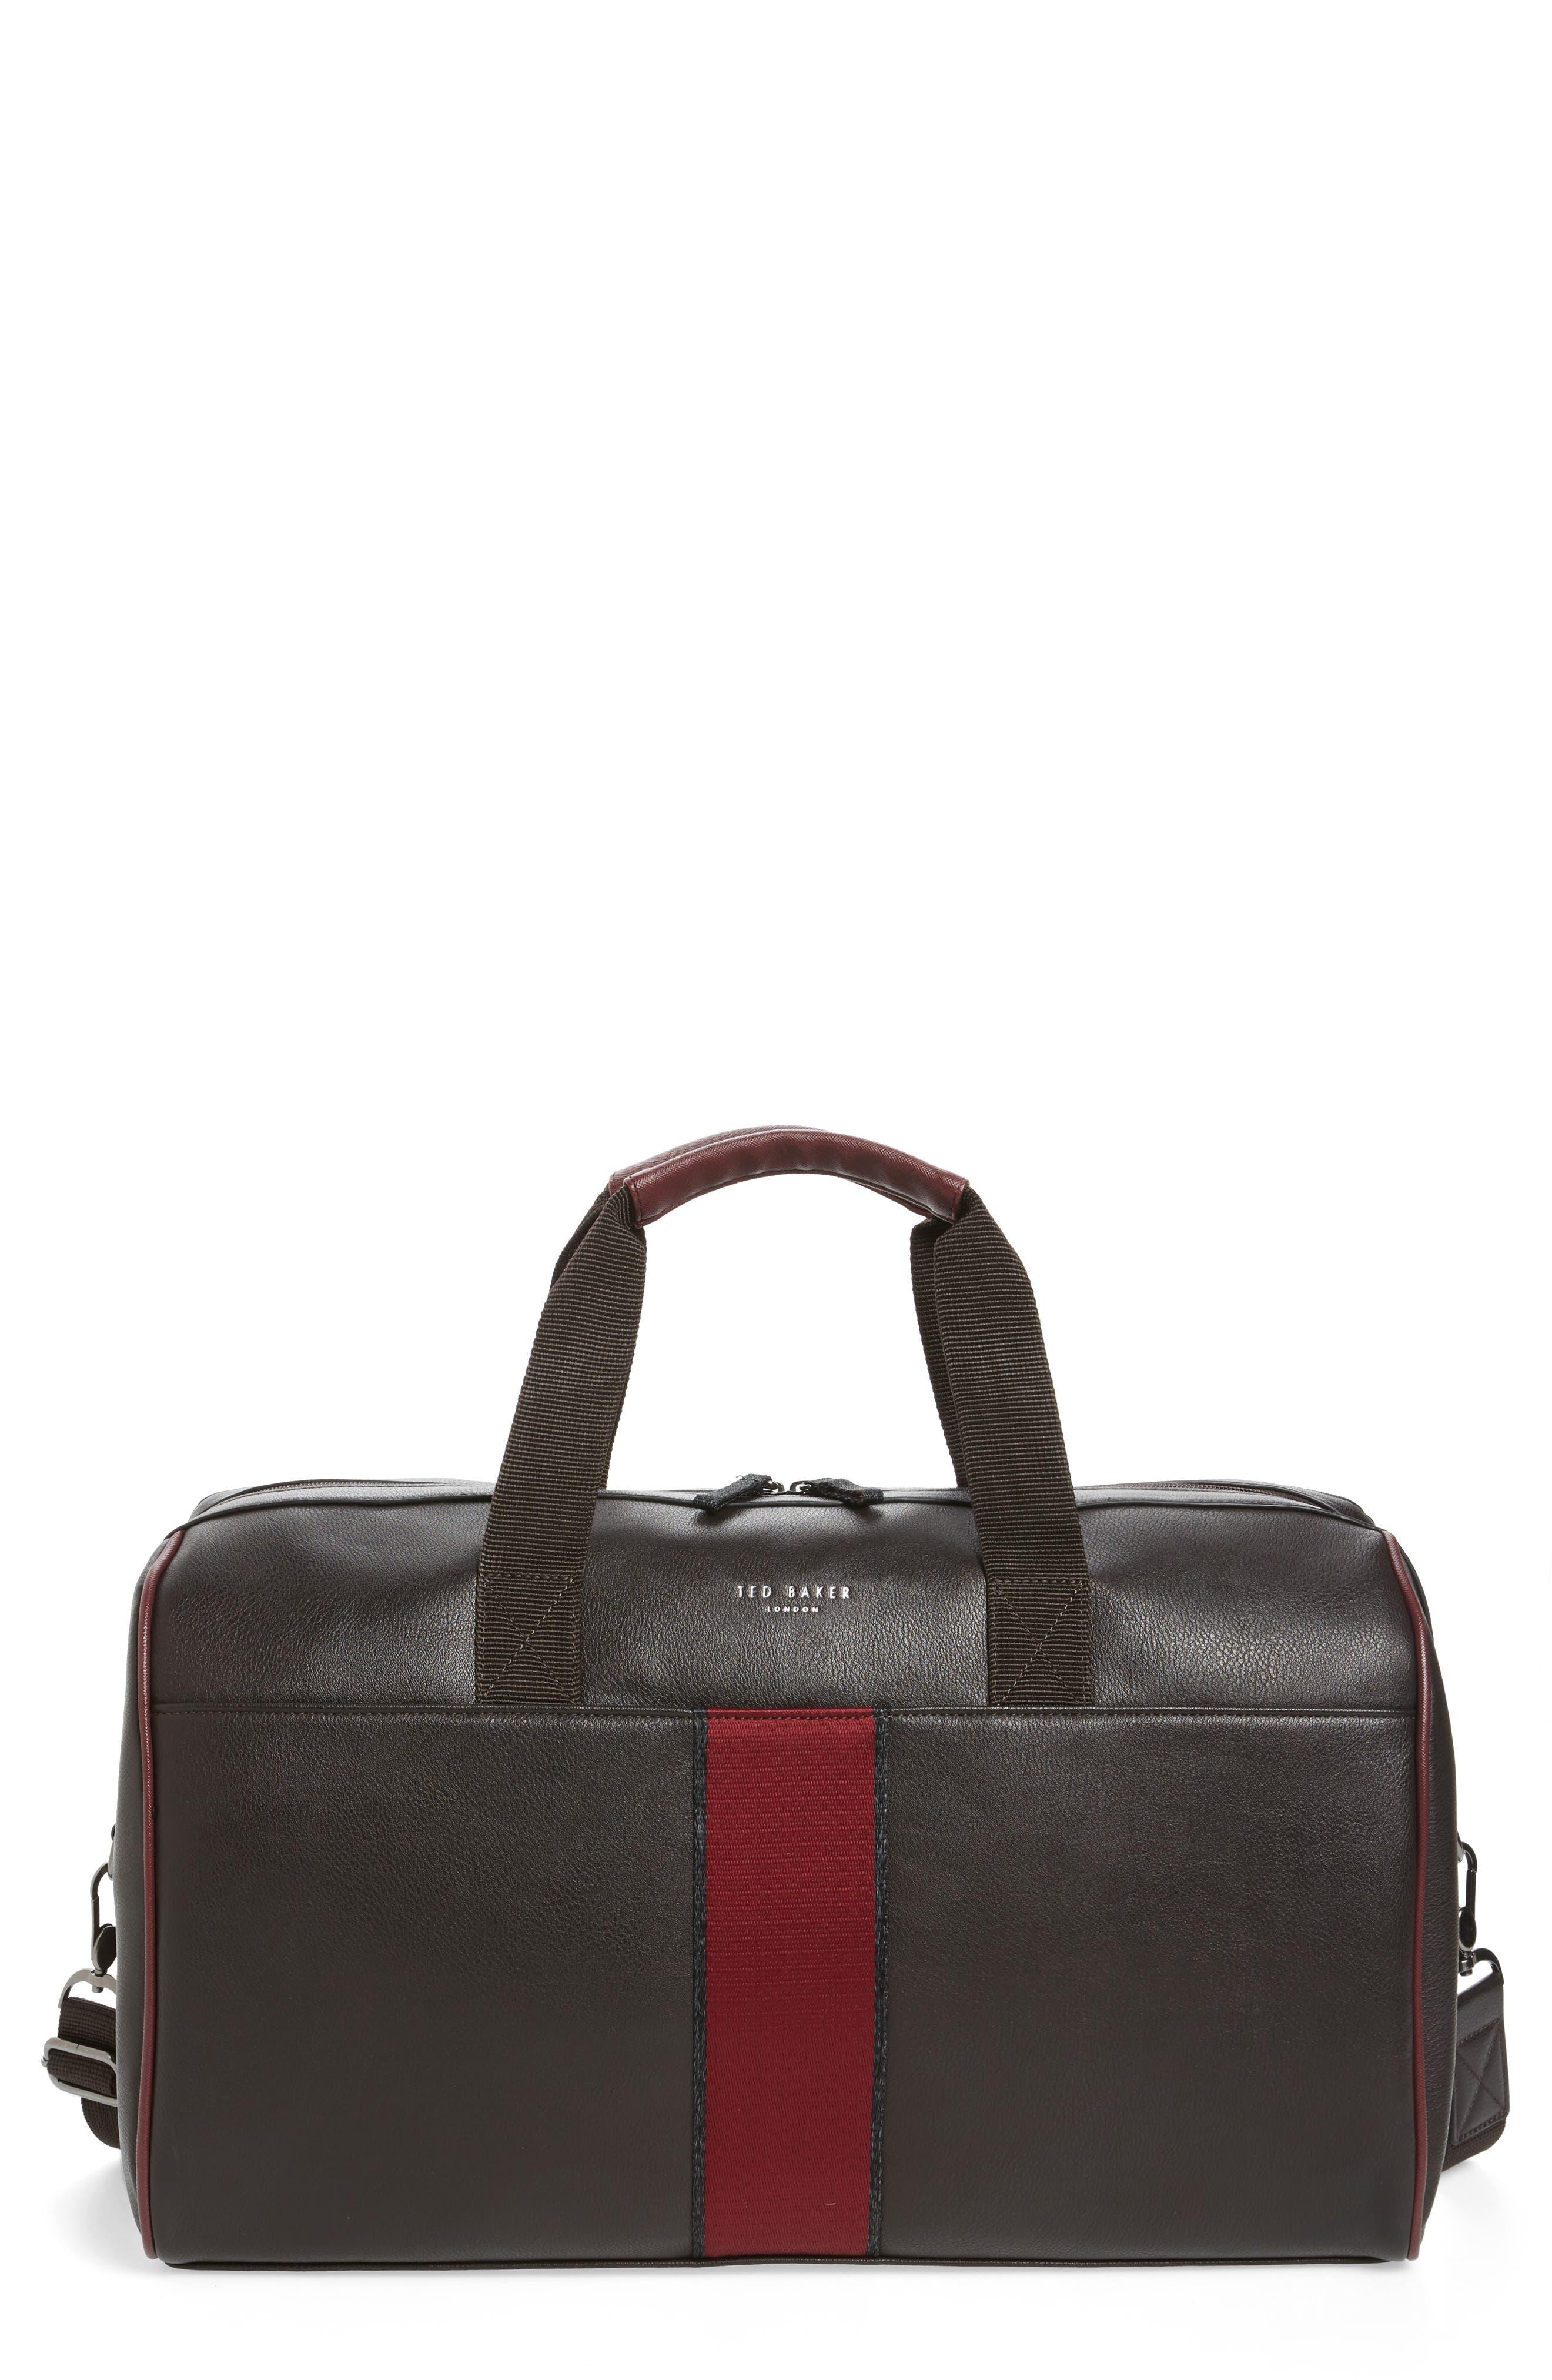 Alternate Image 1 Selected - Ted Baker London Kray Duffel Bag